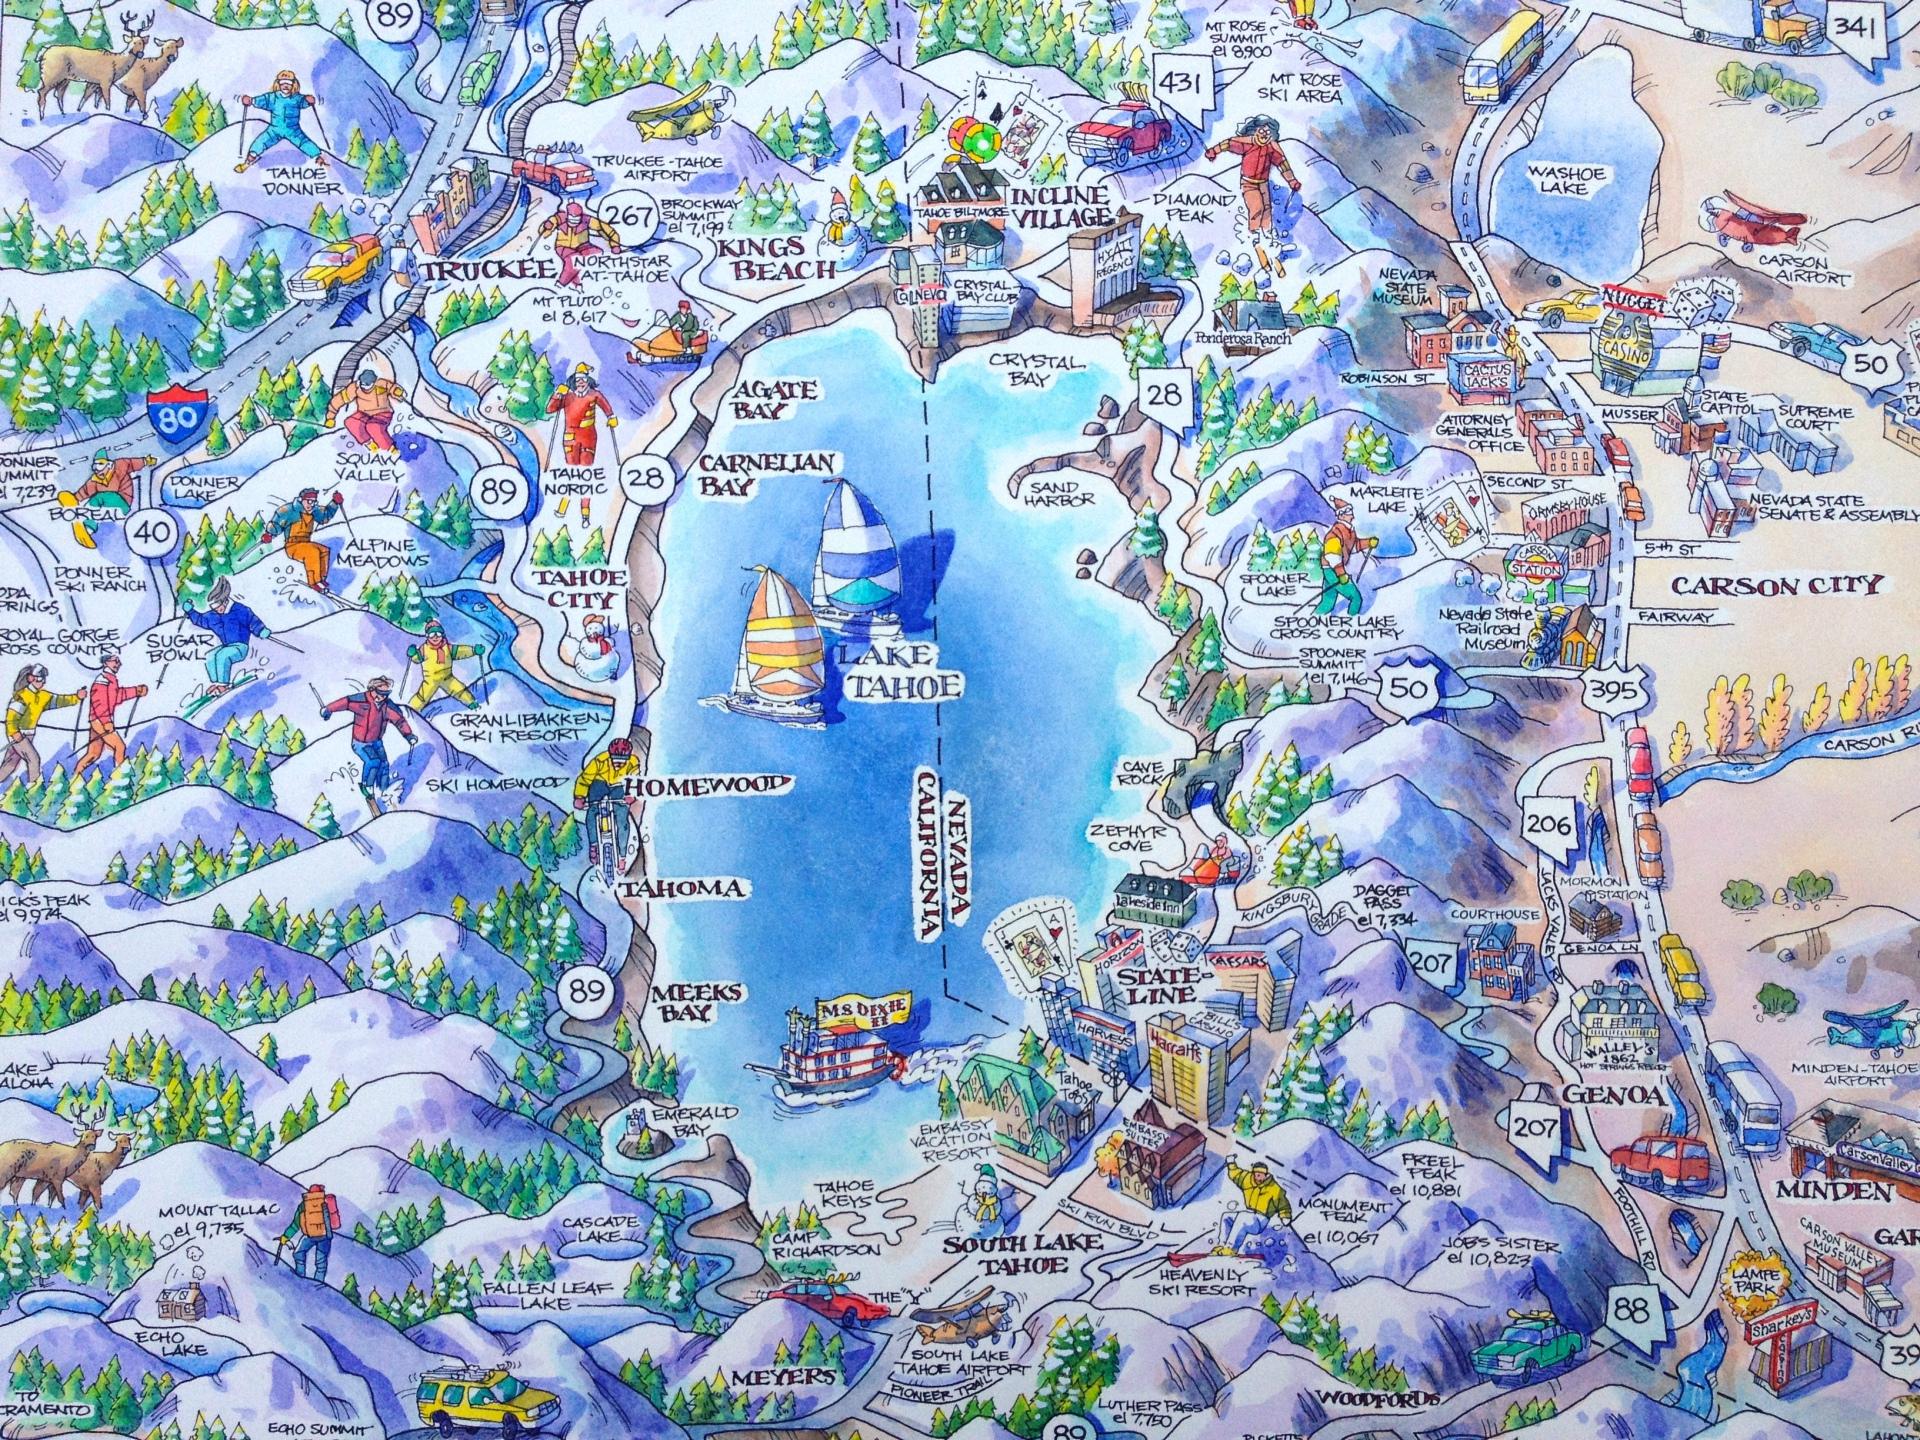 reno/tahoe_winter version